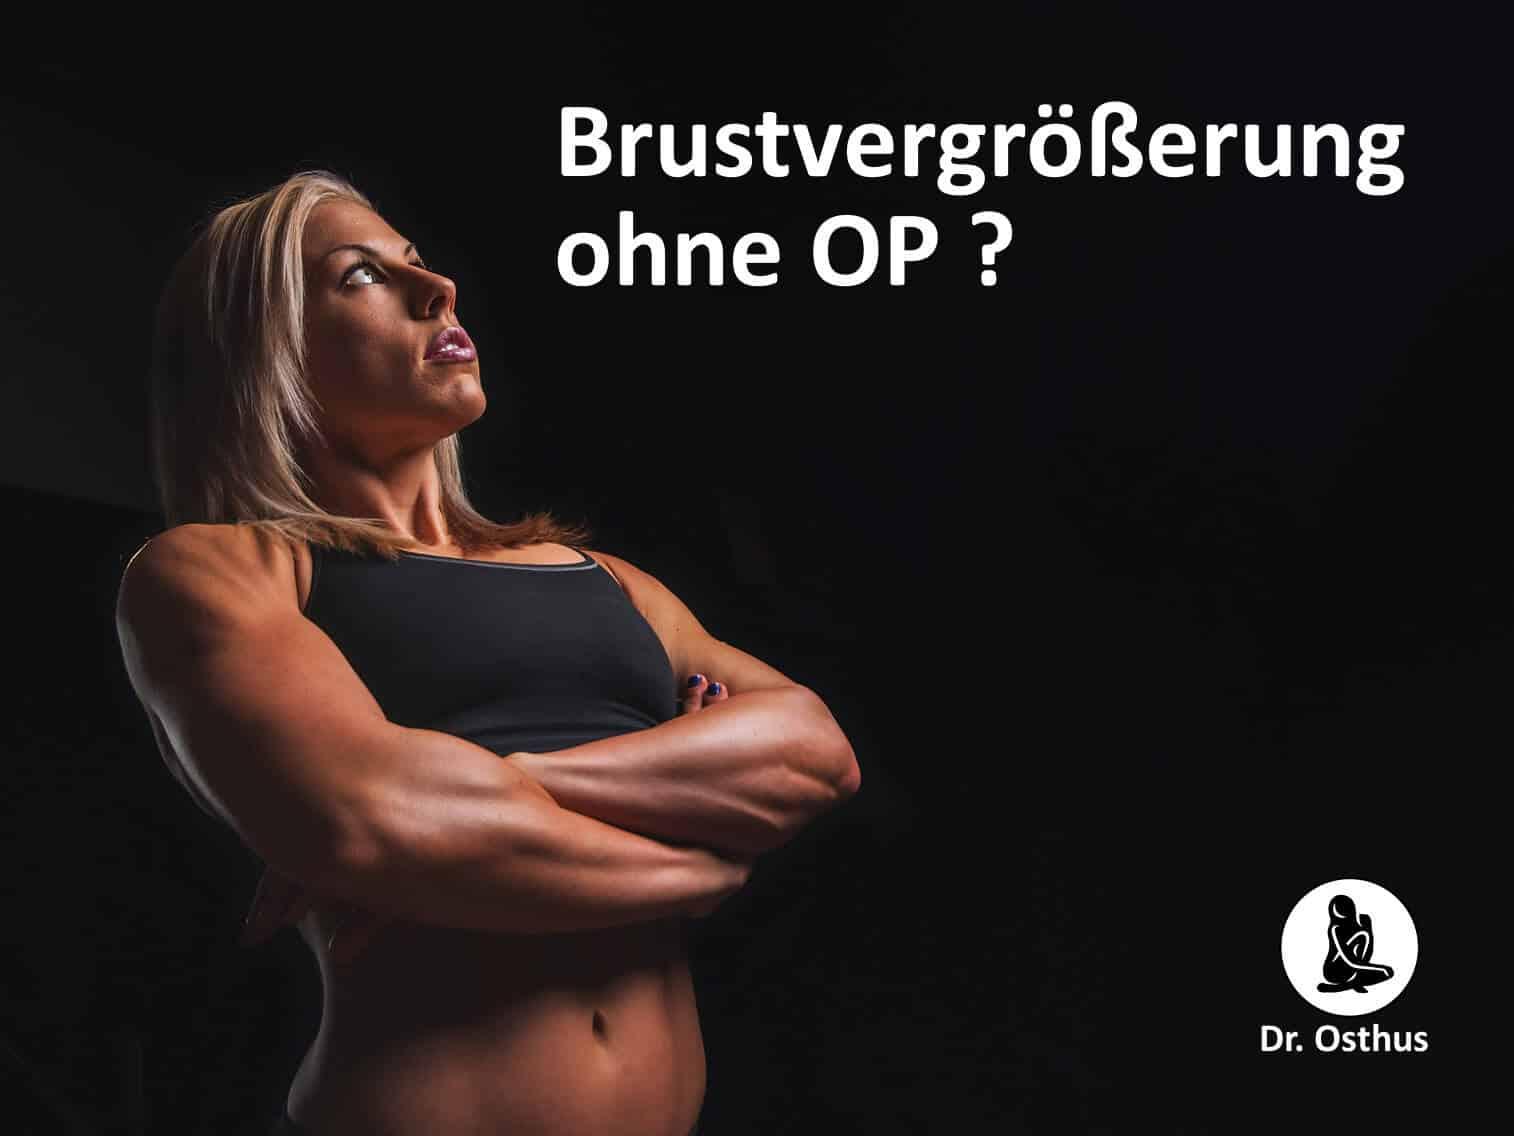 große brüste bzw. Brustvergrößerung ohne OP